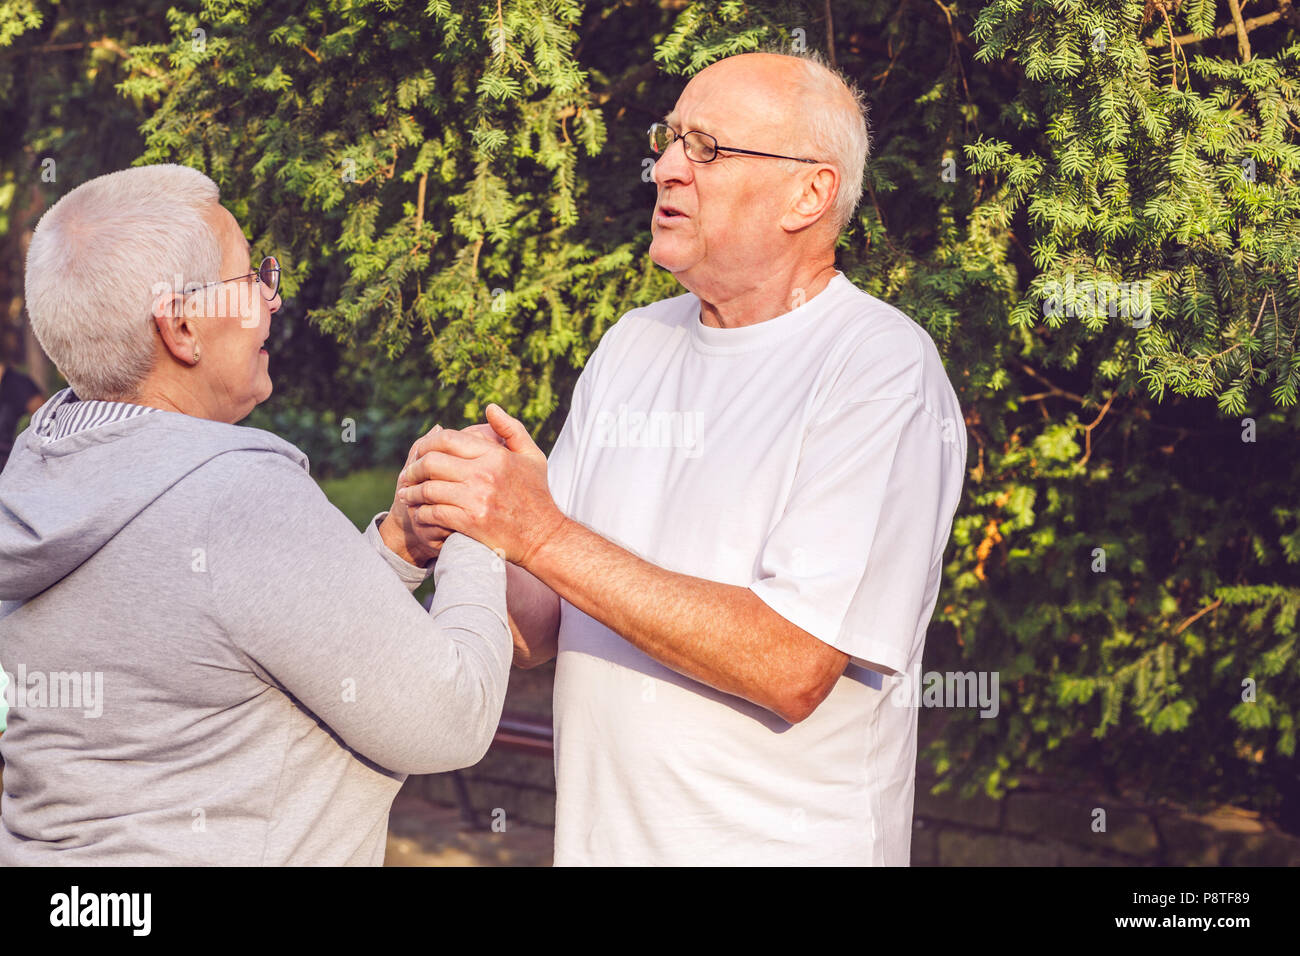 Happy family - Romantic senior couple enjoying walk in park together Stock Photo